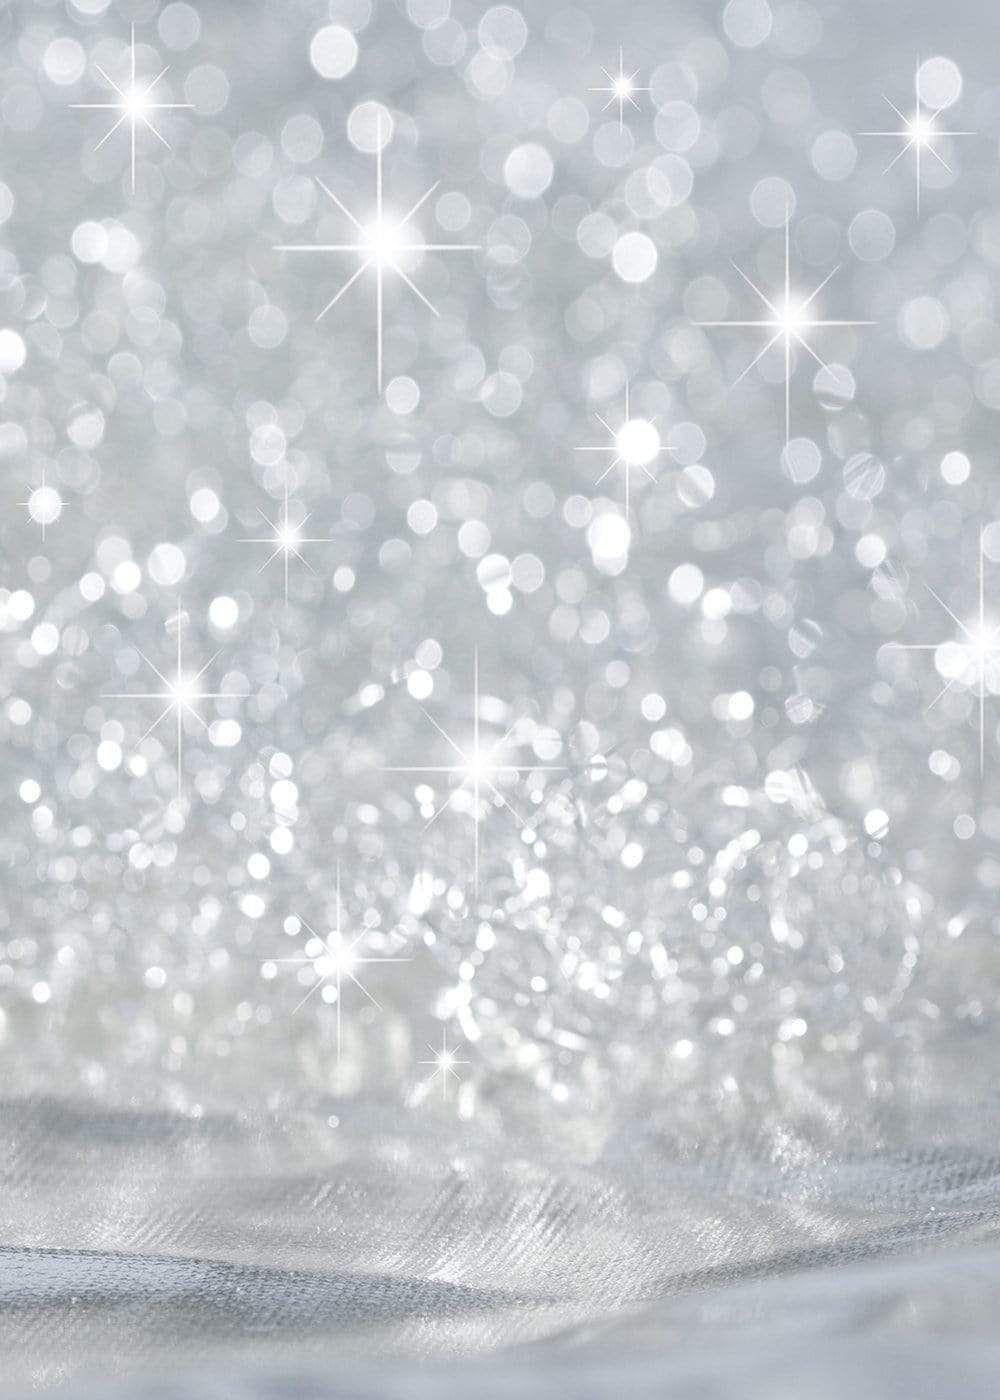 Silver  Stars Glitter Bokeh Bright Backdrop for Photography GB-97 - 20'W*10'H(6*3M)